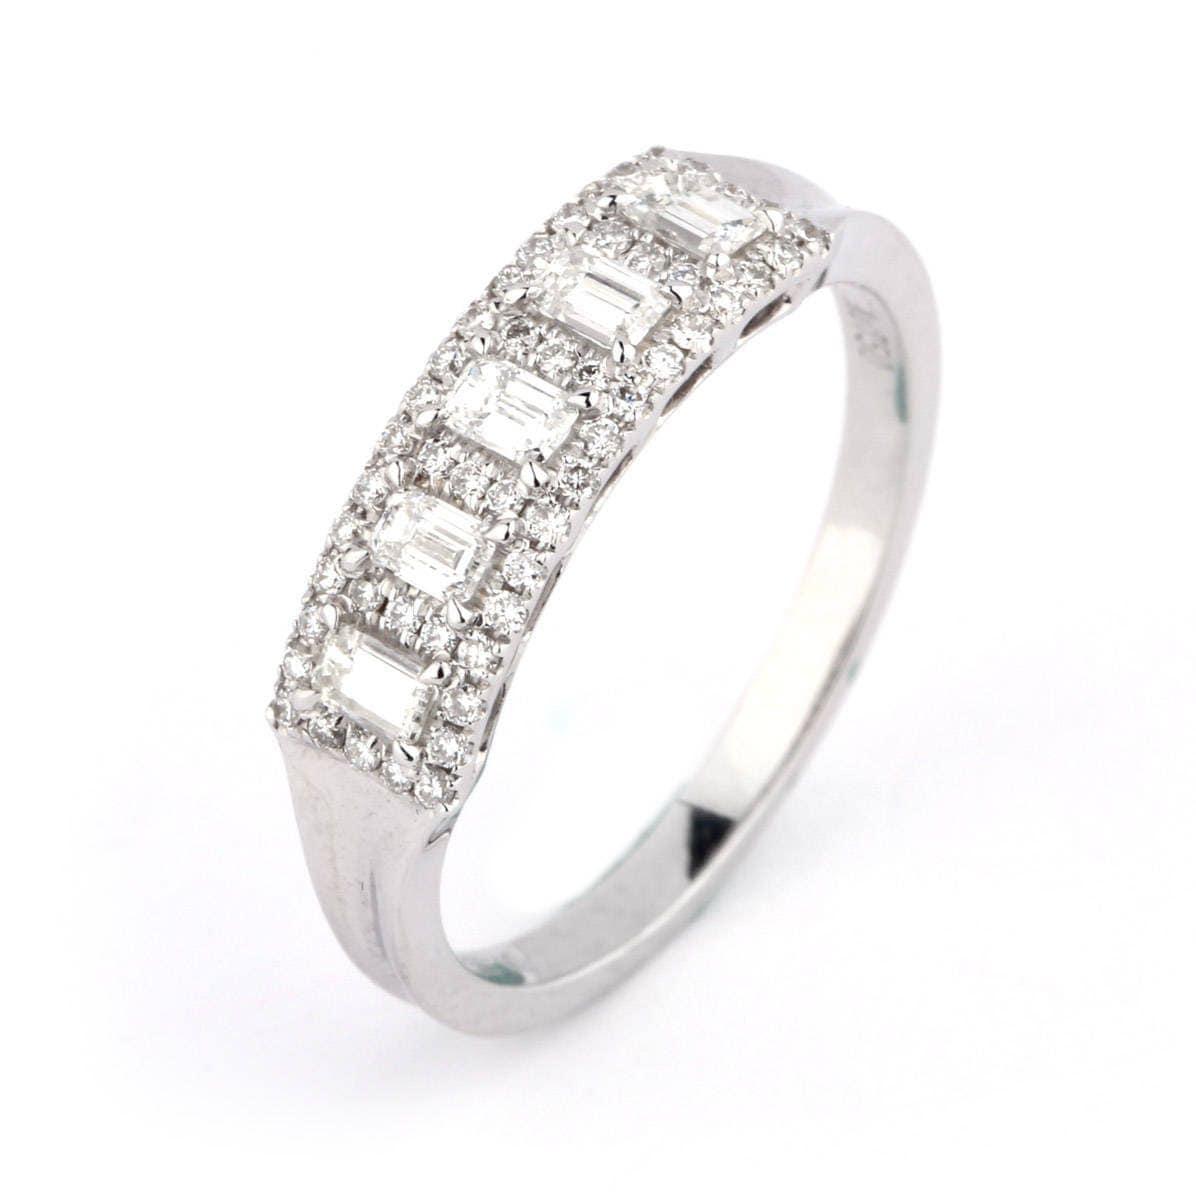 18K White Gold Baguette Cut Diamond Wedding Ring /Simple Eternity ...